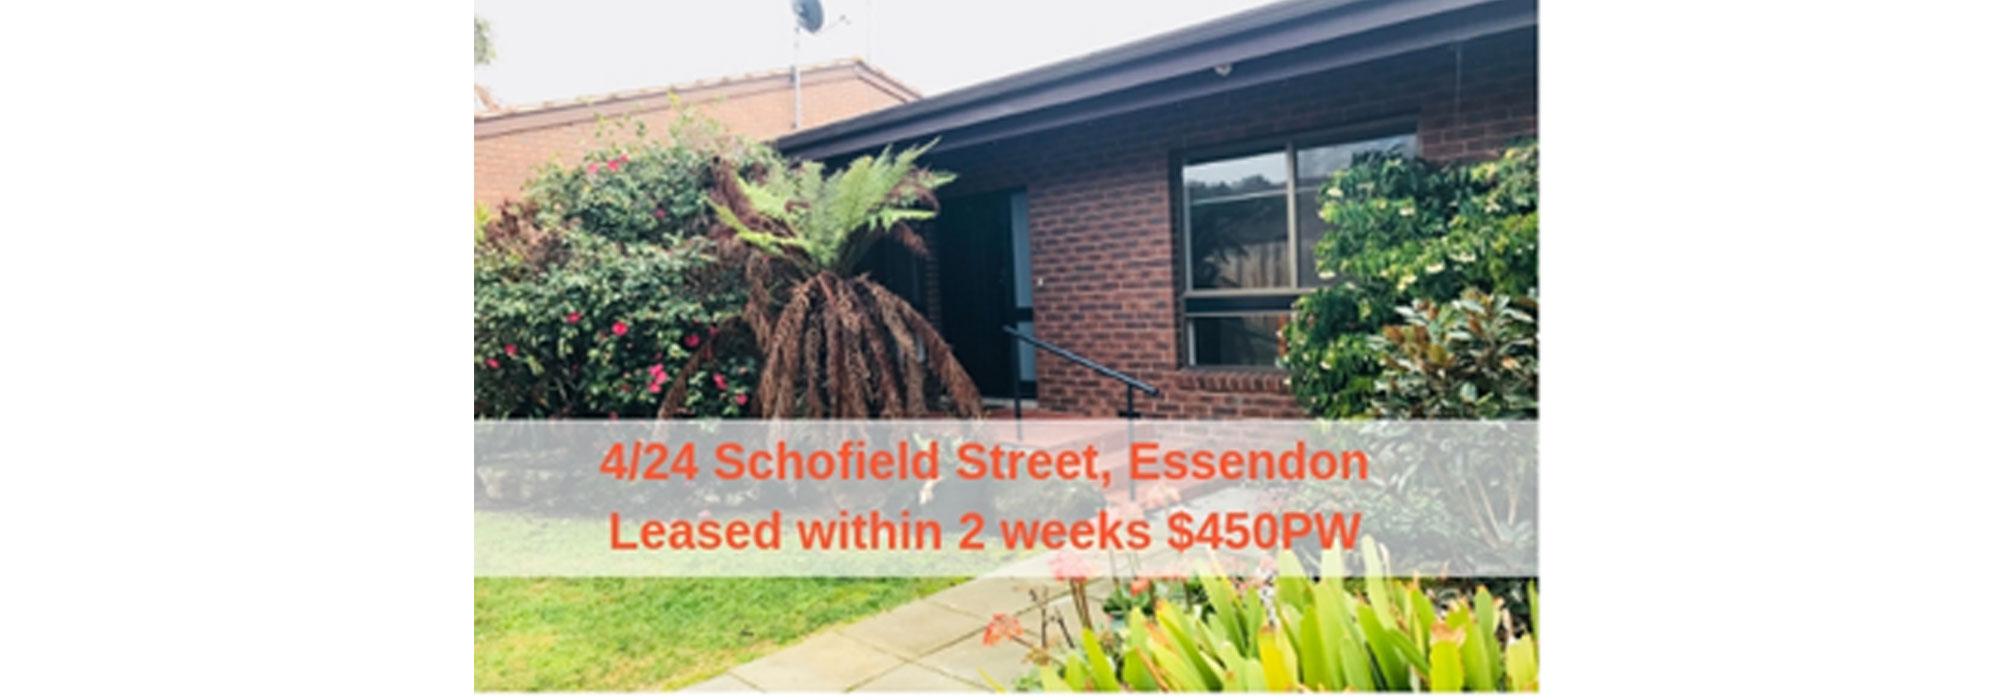 4/24 Schofield Street,Essendon